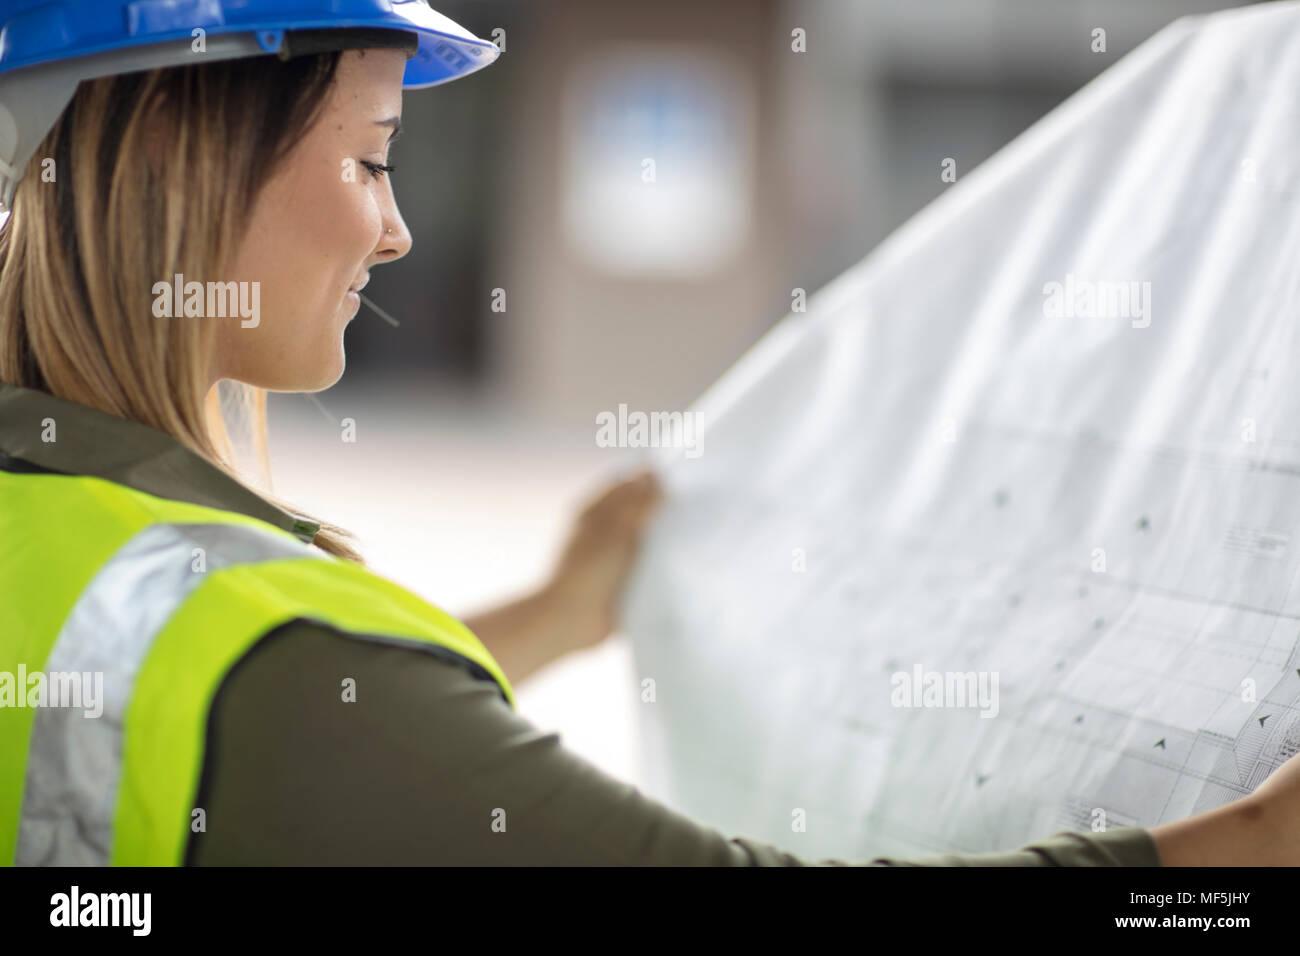 Woman wearing hard hat looking at construction plan Photo Stock